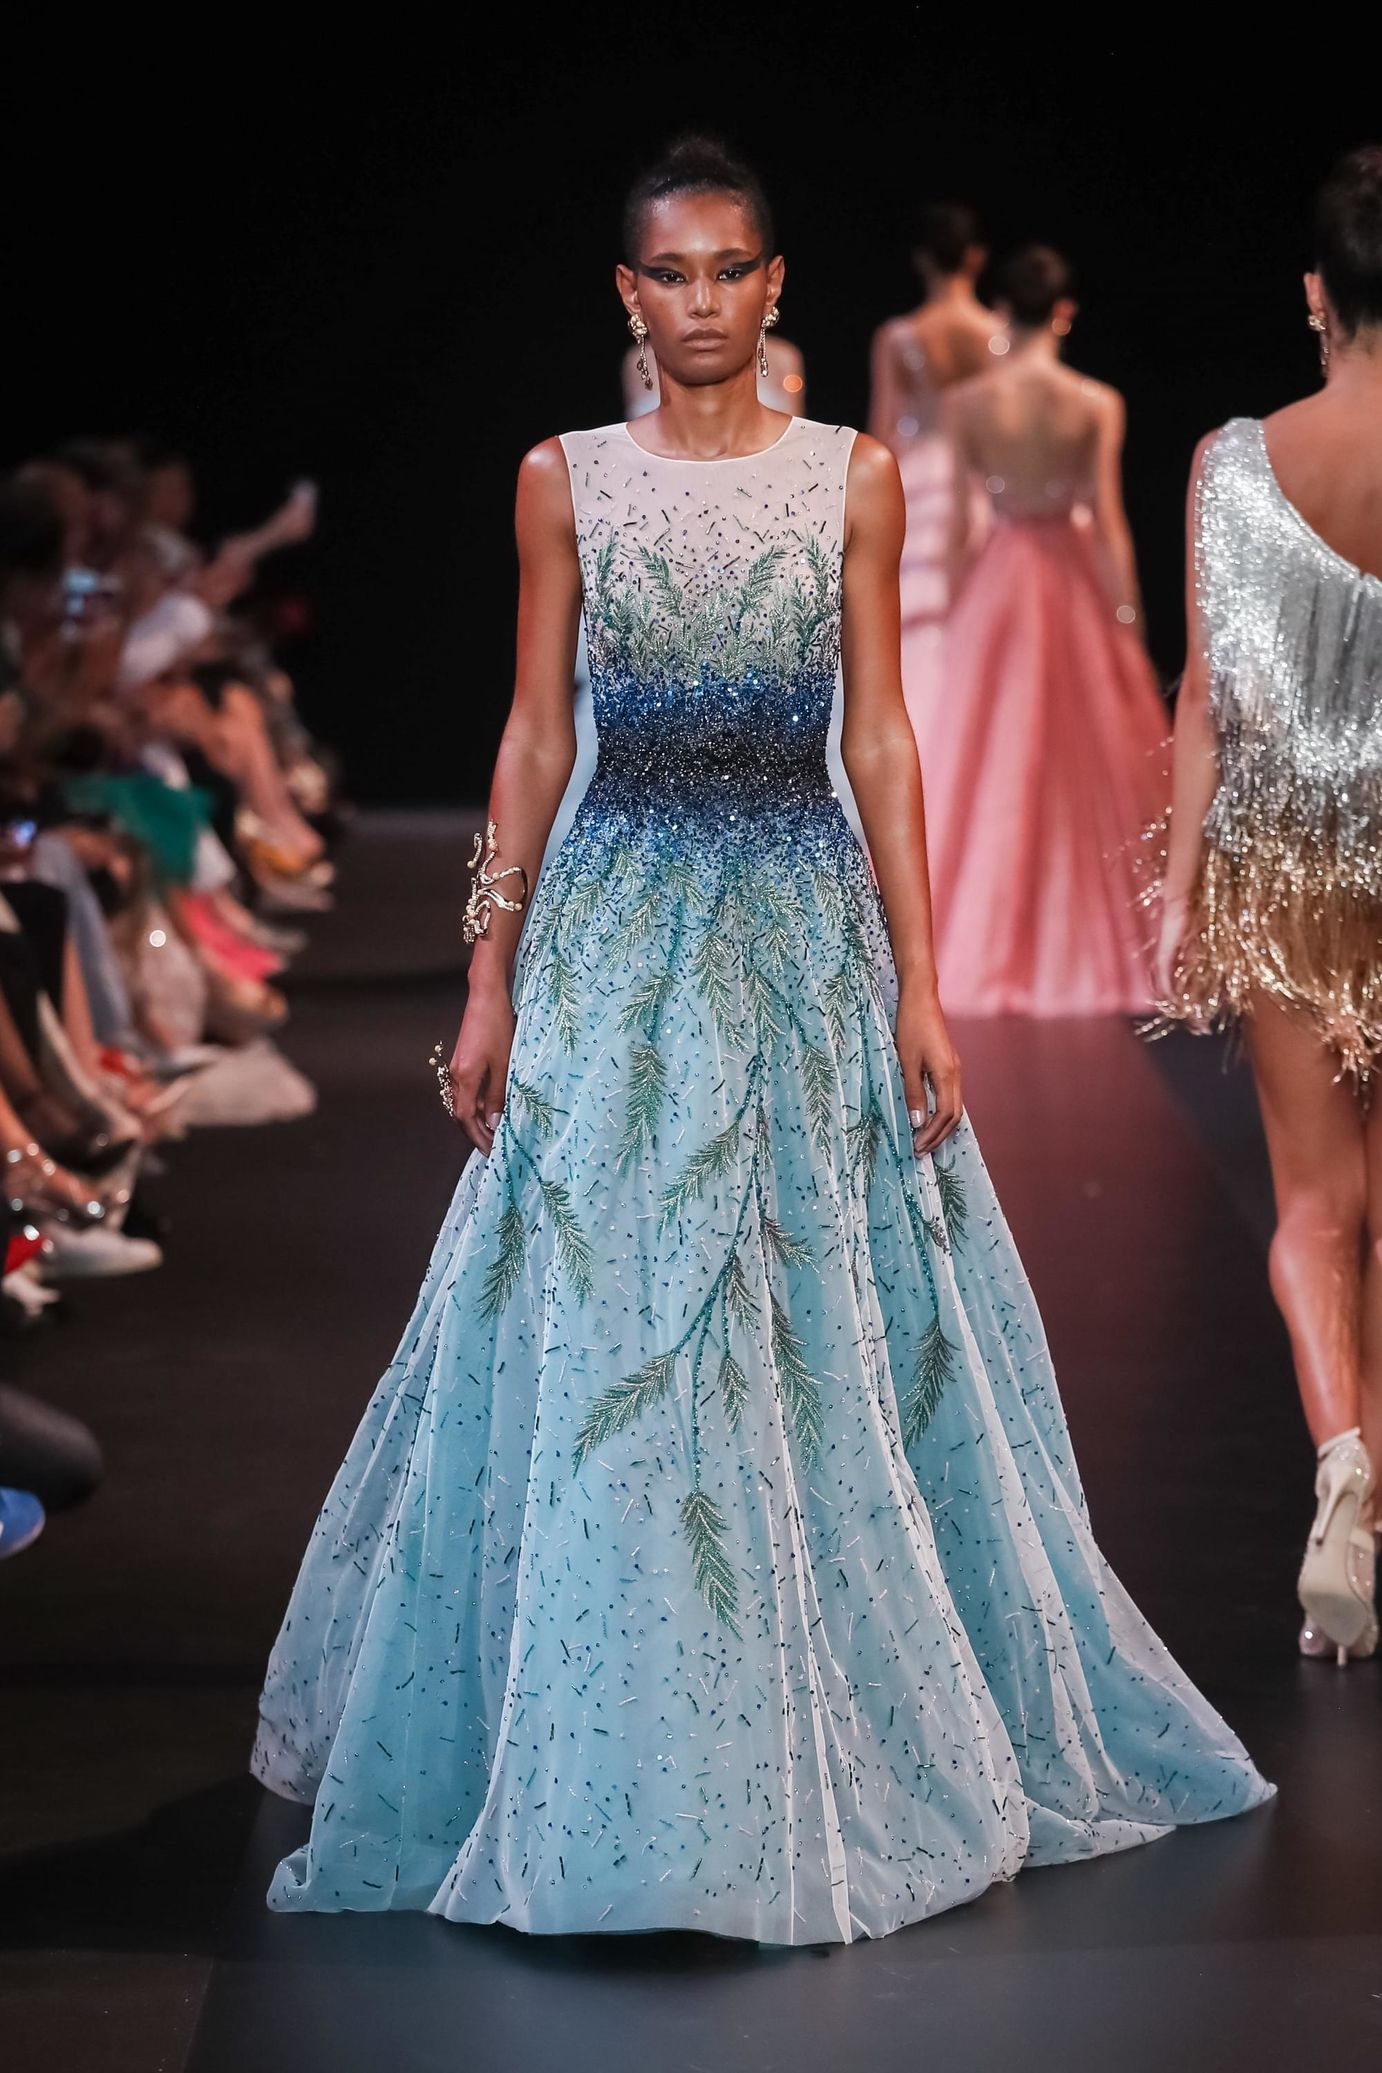 a1a61495a67b Georges Hobeika Haute couture Fall Winter 2018-2019 19